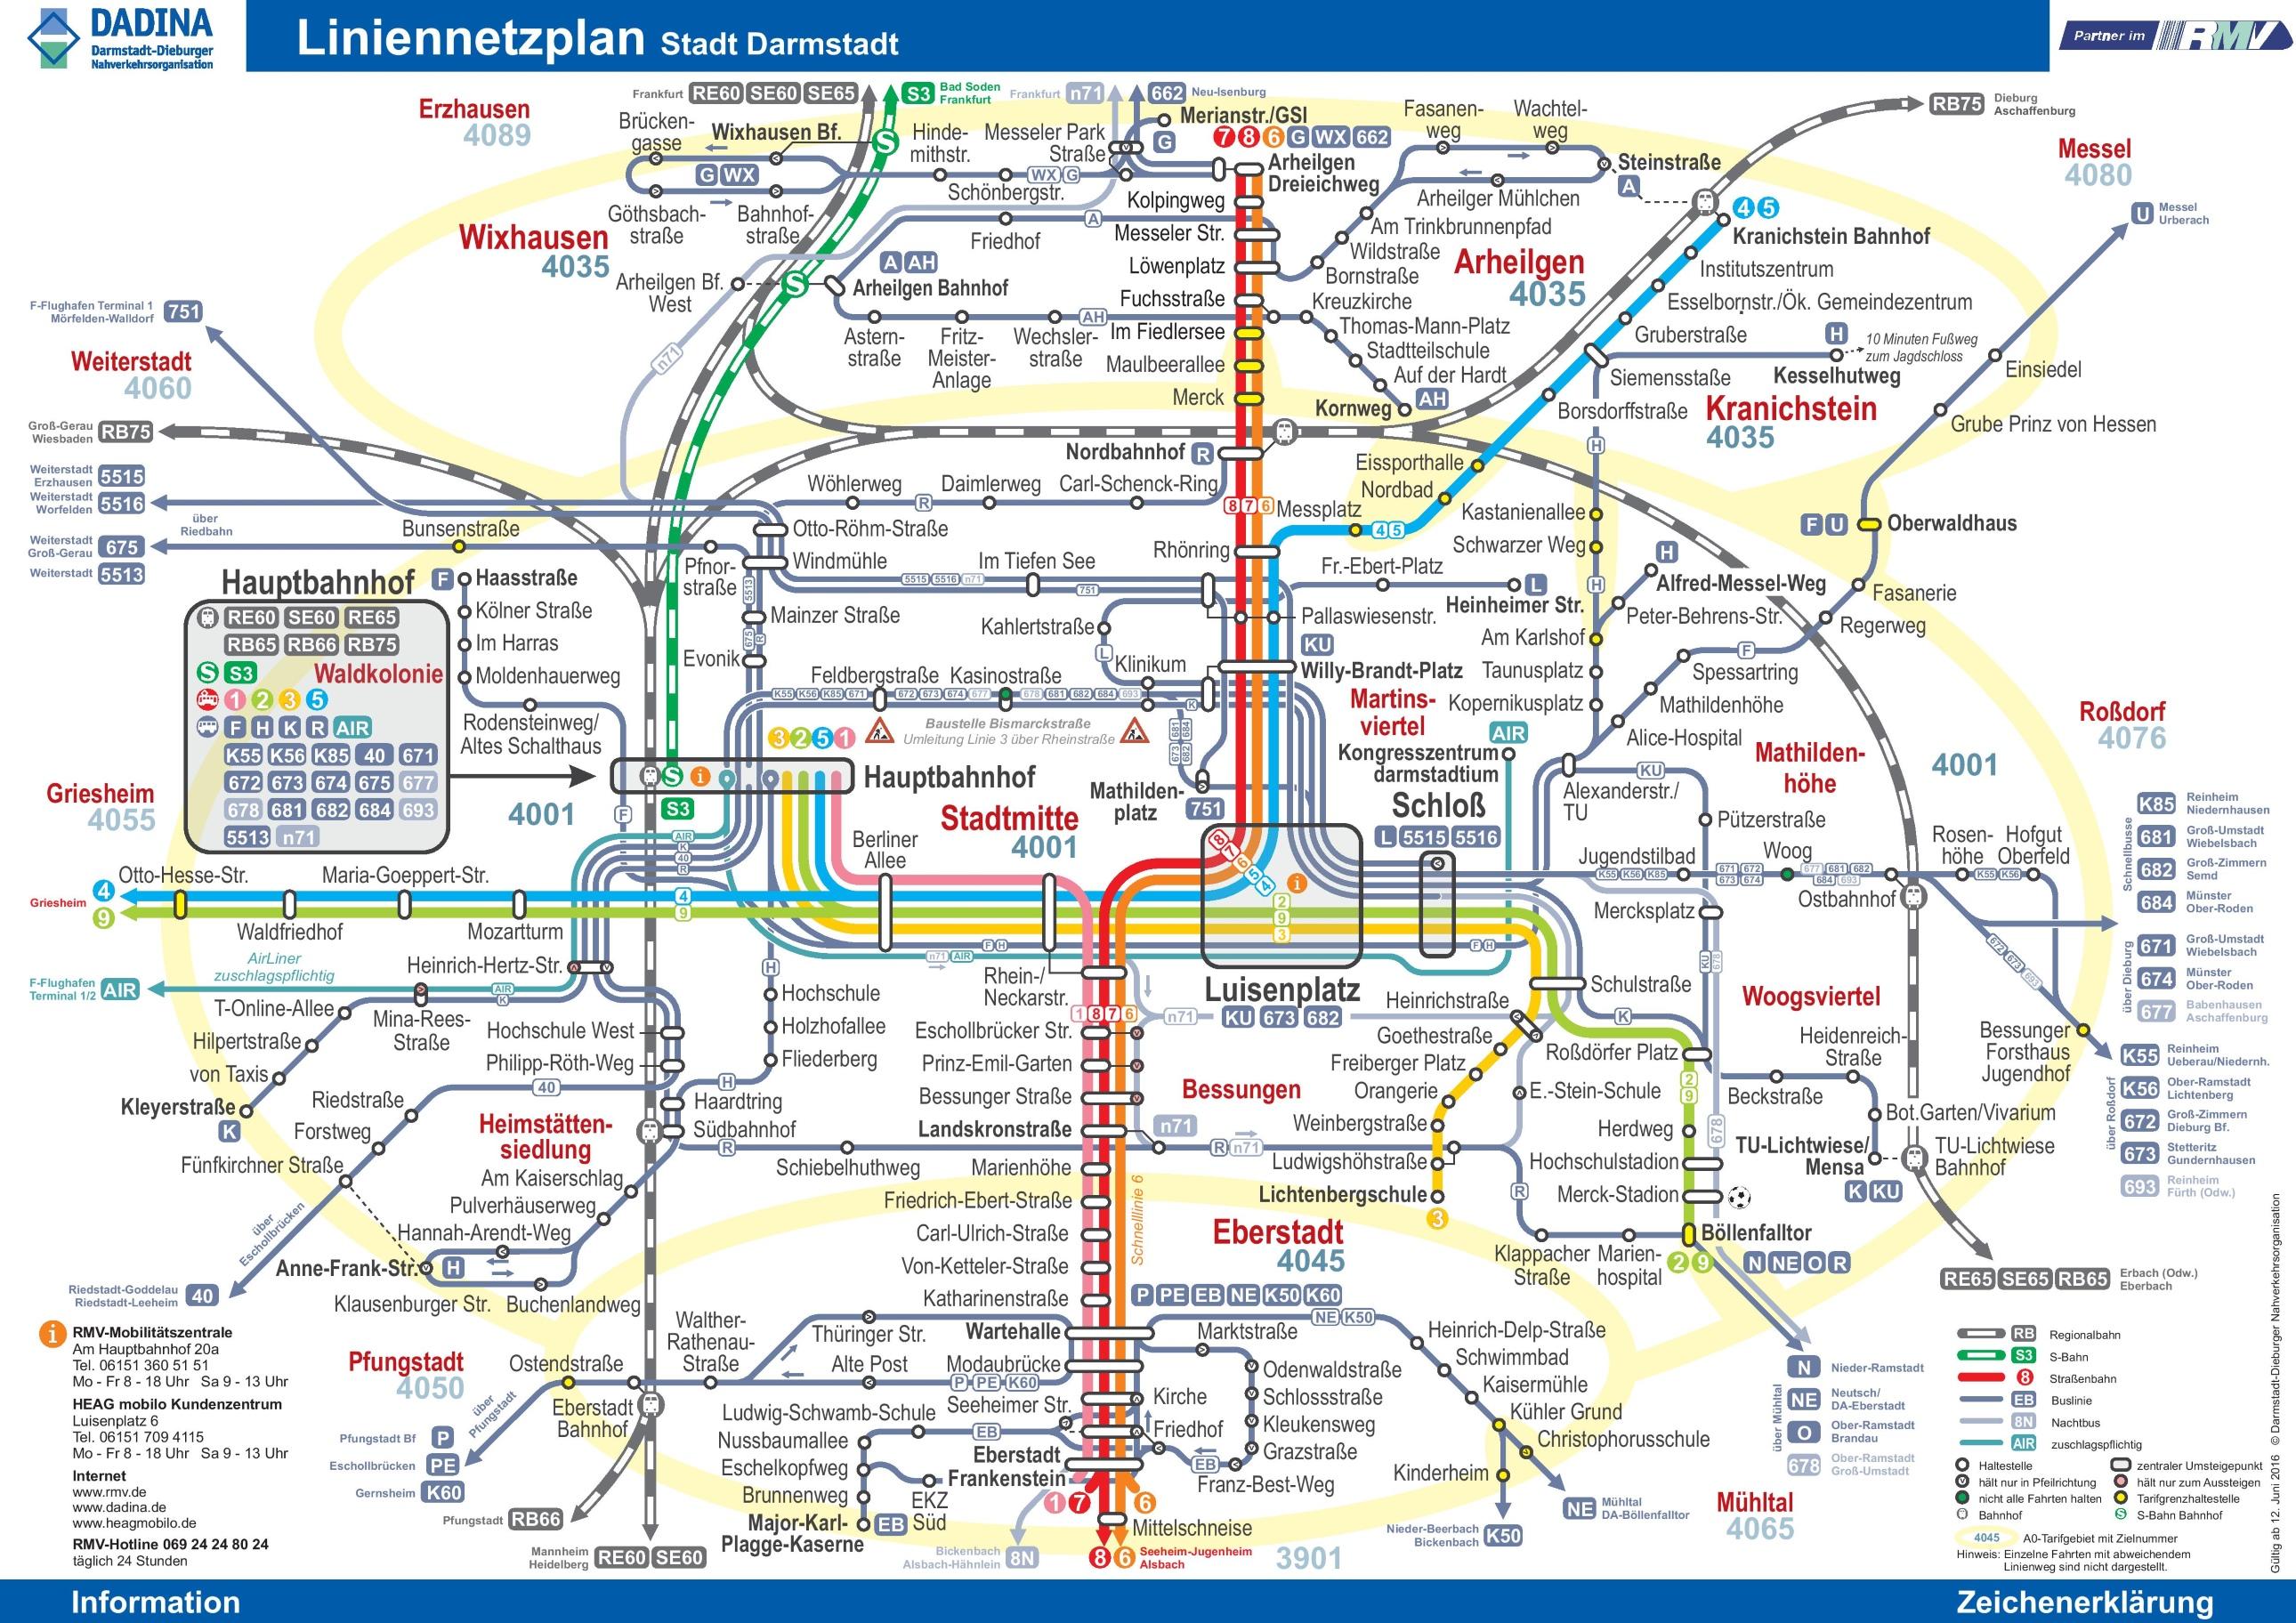 Darmstadt transport map